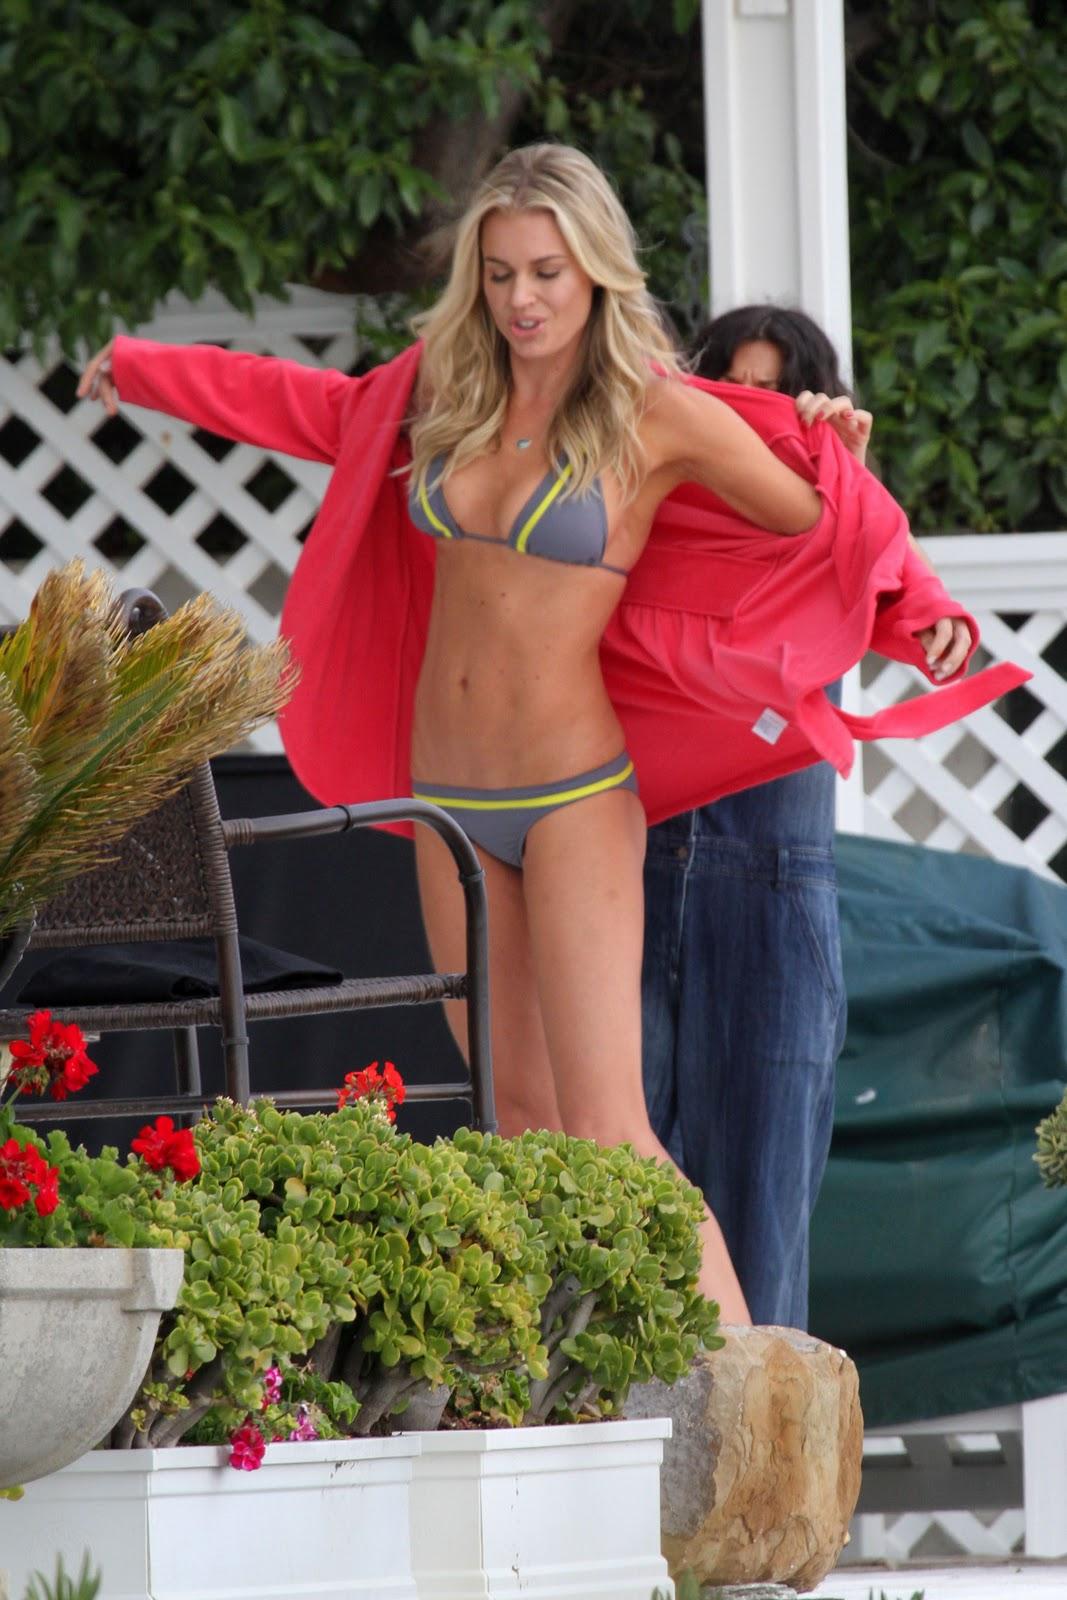 http://4.bp.blogspot.com/-HxMBvWc0qOo/Trhb_AVccAI/AAAAAAAAD80/p8B_iaxnL1U/s1600/Rebecca+Romijn+wearing+bikinis+on+set+of+photoshoot+in+LA-07.jpg